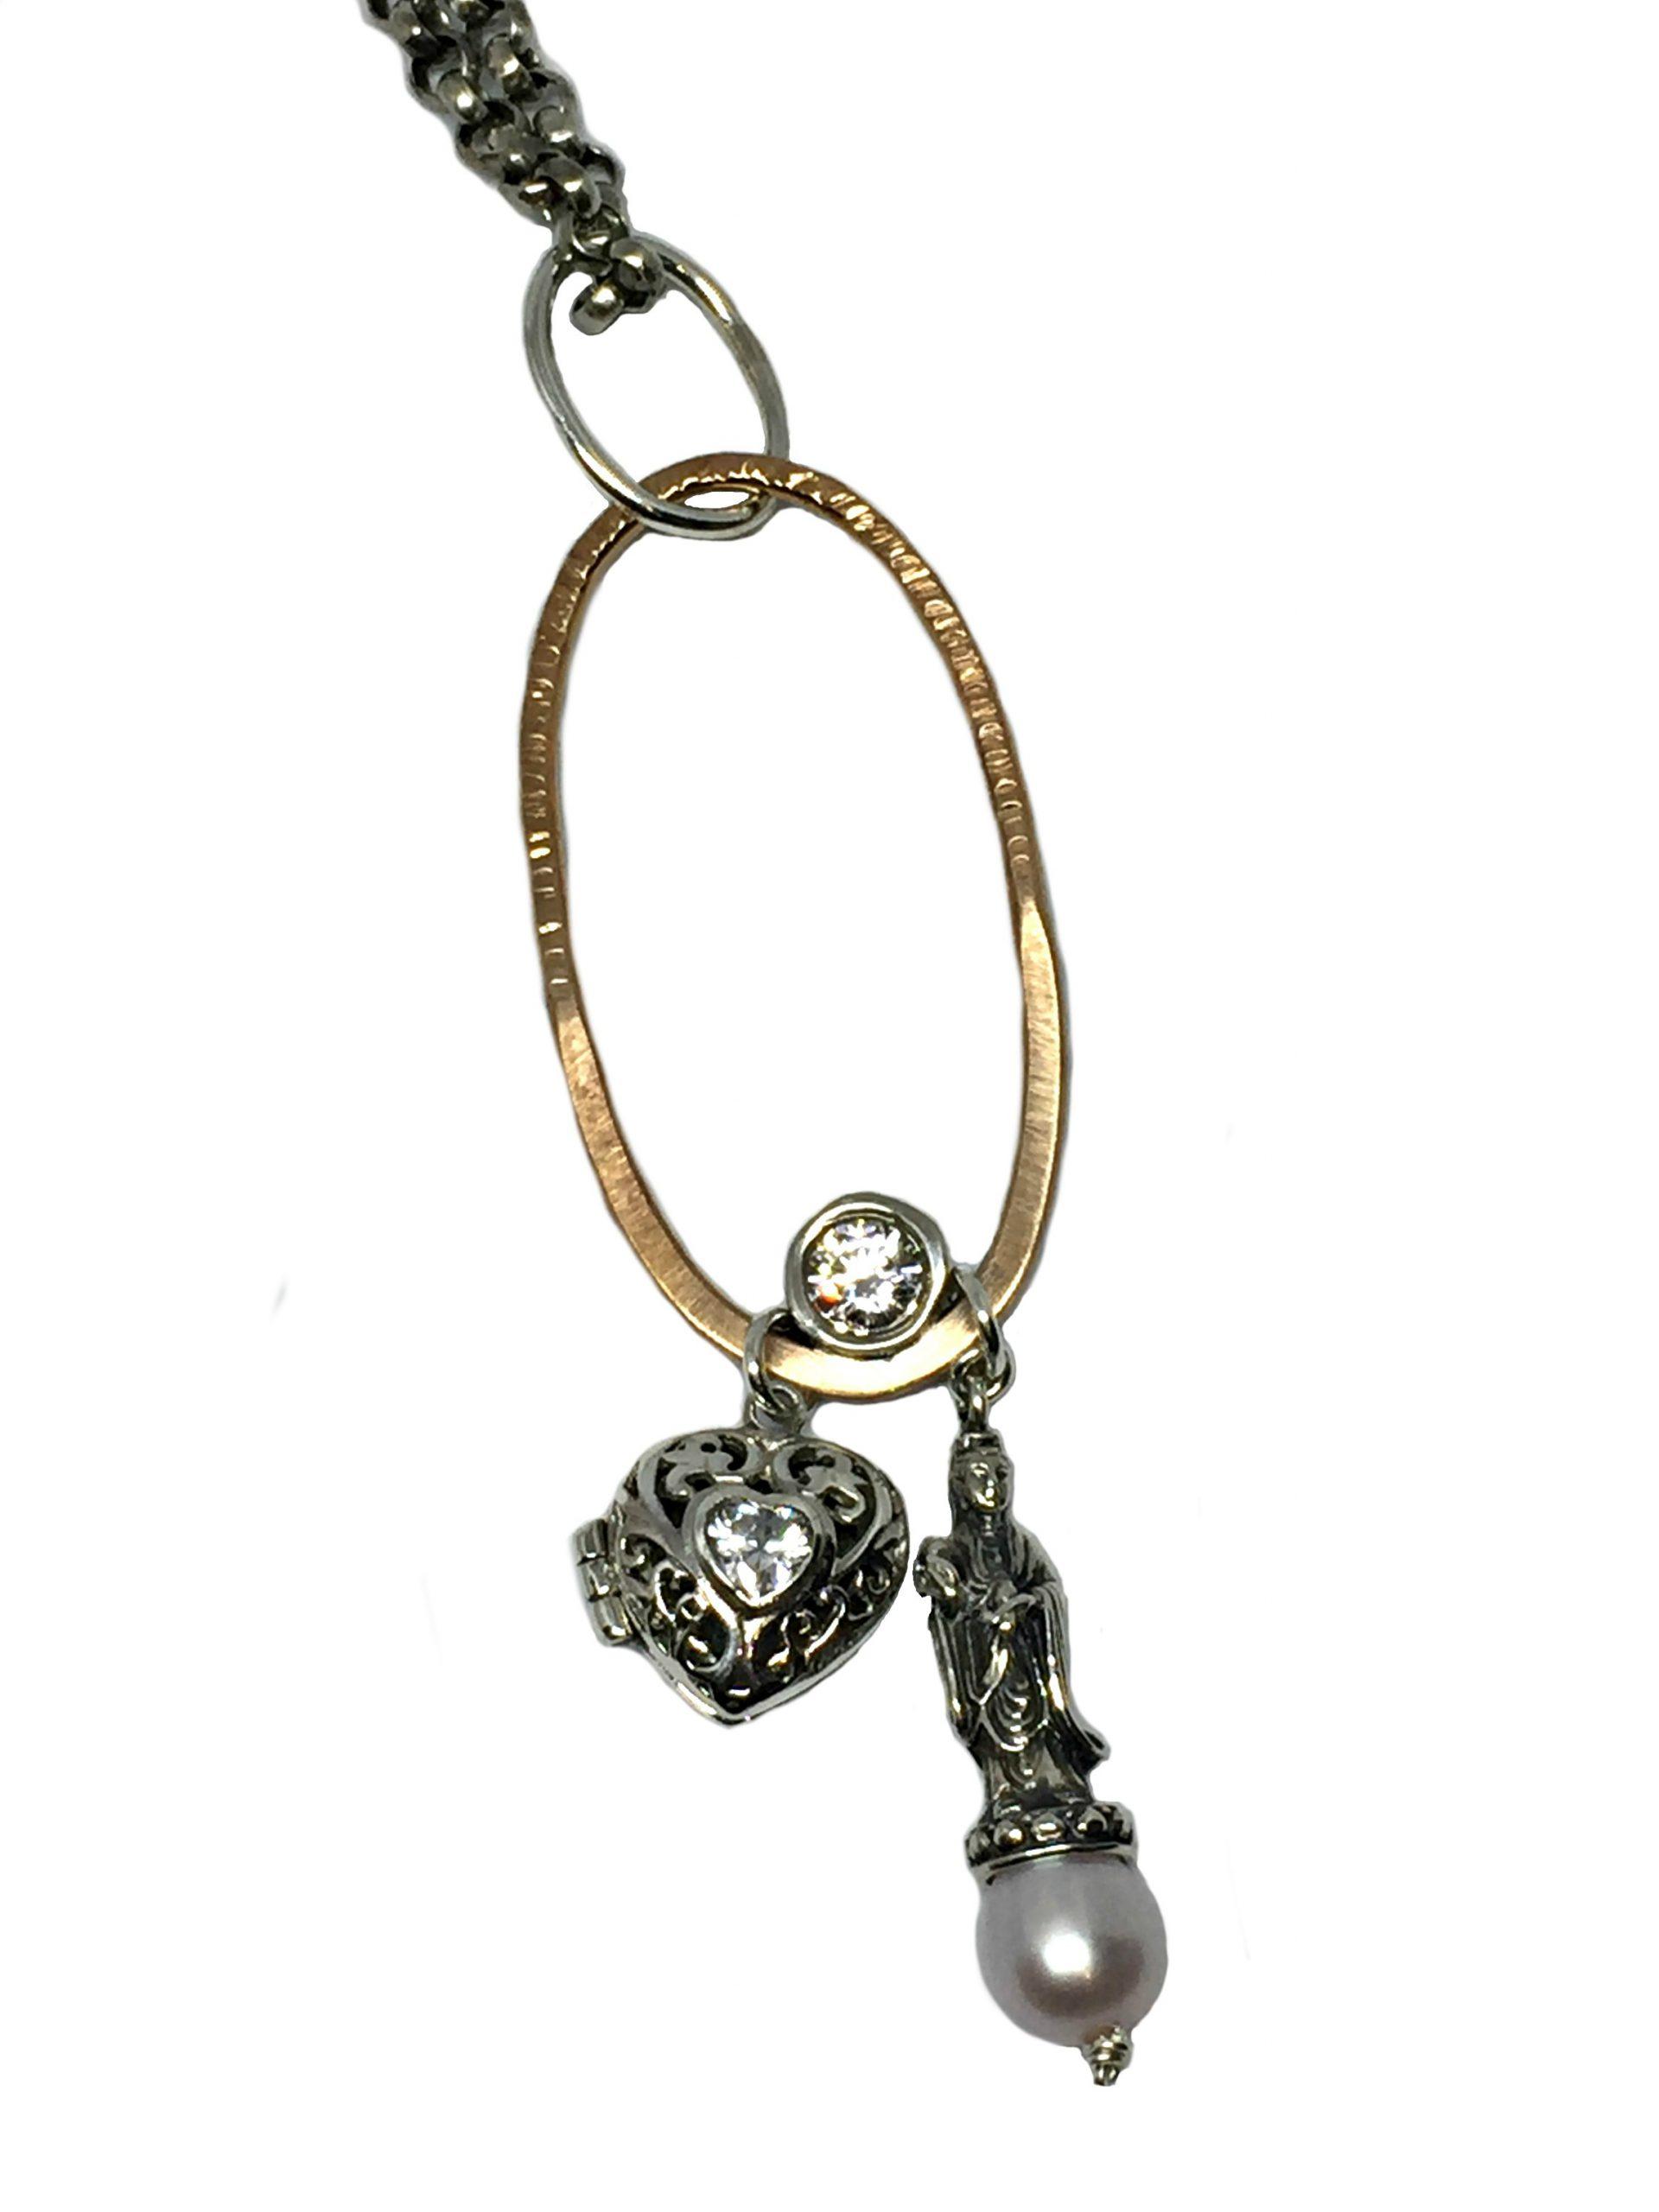 Bronze, Sterling Silver, Pearl, + CZ Locket Pendant by Karyn Chopik | Effusion Art Gallery + Cast Glass Studio, Invermere BC